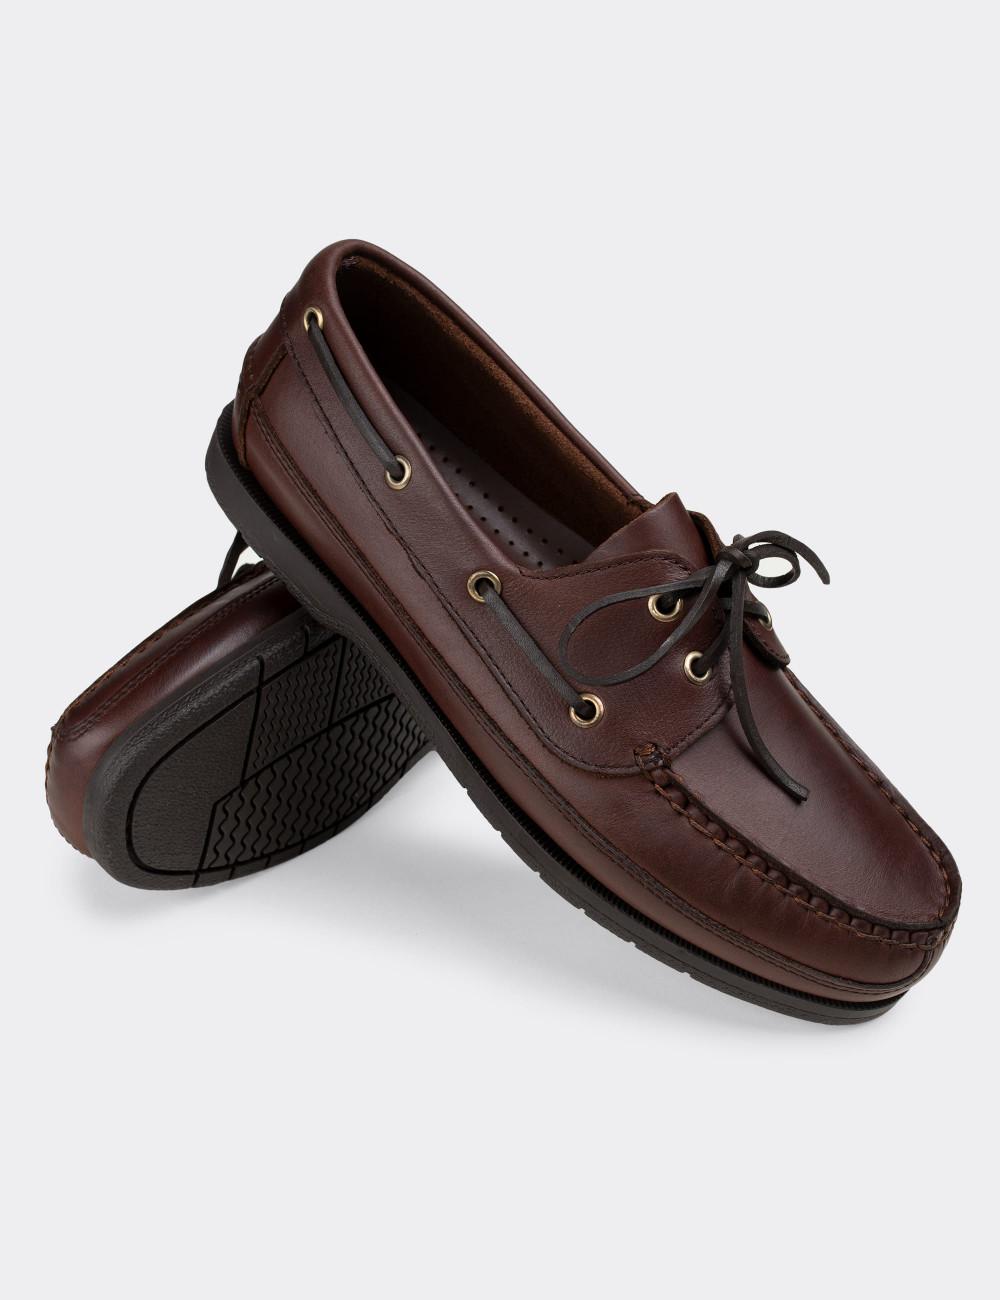 Hakiki Deri Kahverengi Marin Erkek Ayakkabı - 01543MKHVC01